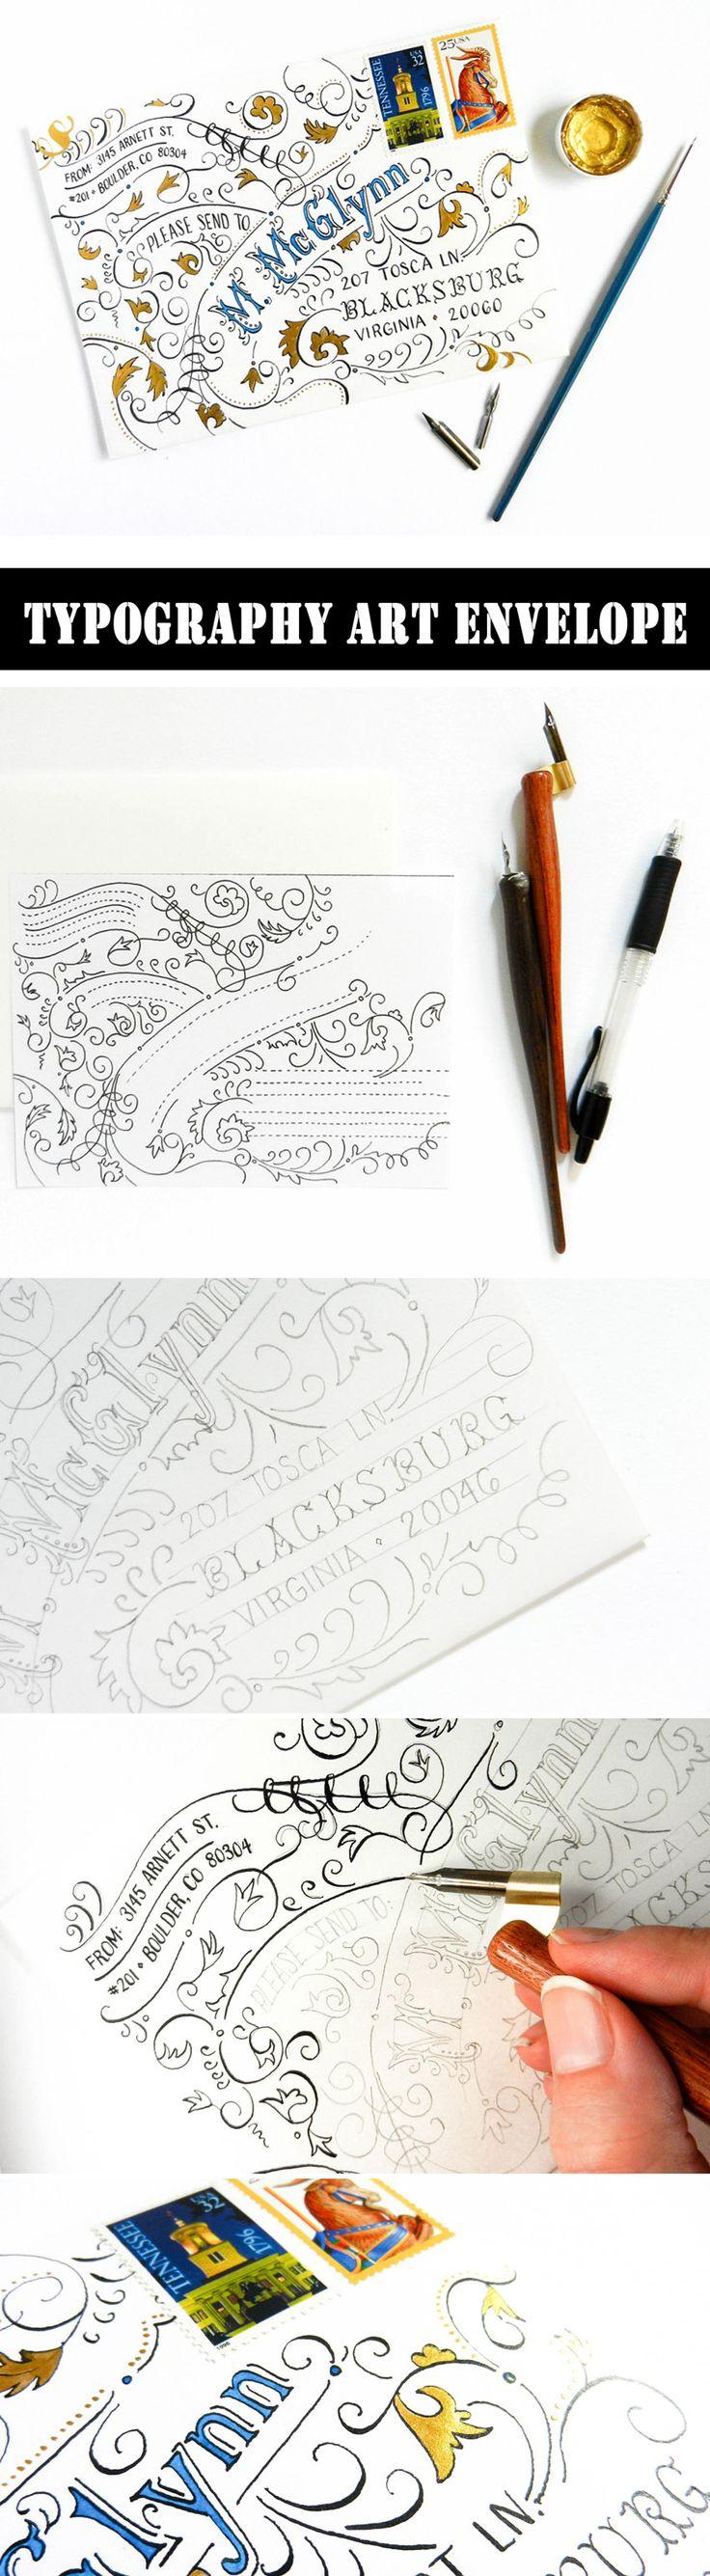 Typography Art Envelope Tutorial  #typography  #handlettering  #tutorial    https://thepostmansknock.com/typography-art-envelope-tutorial/